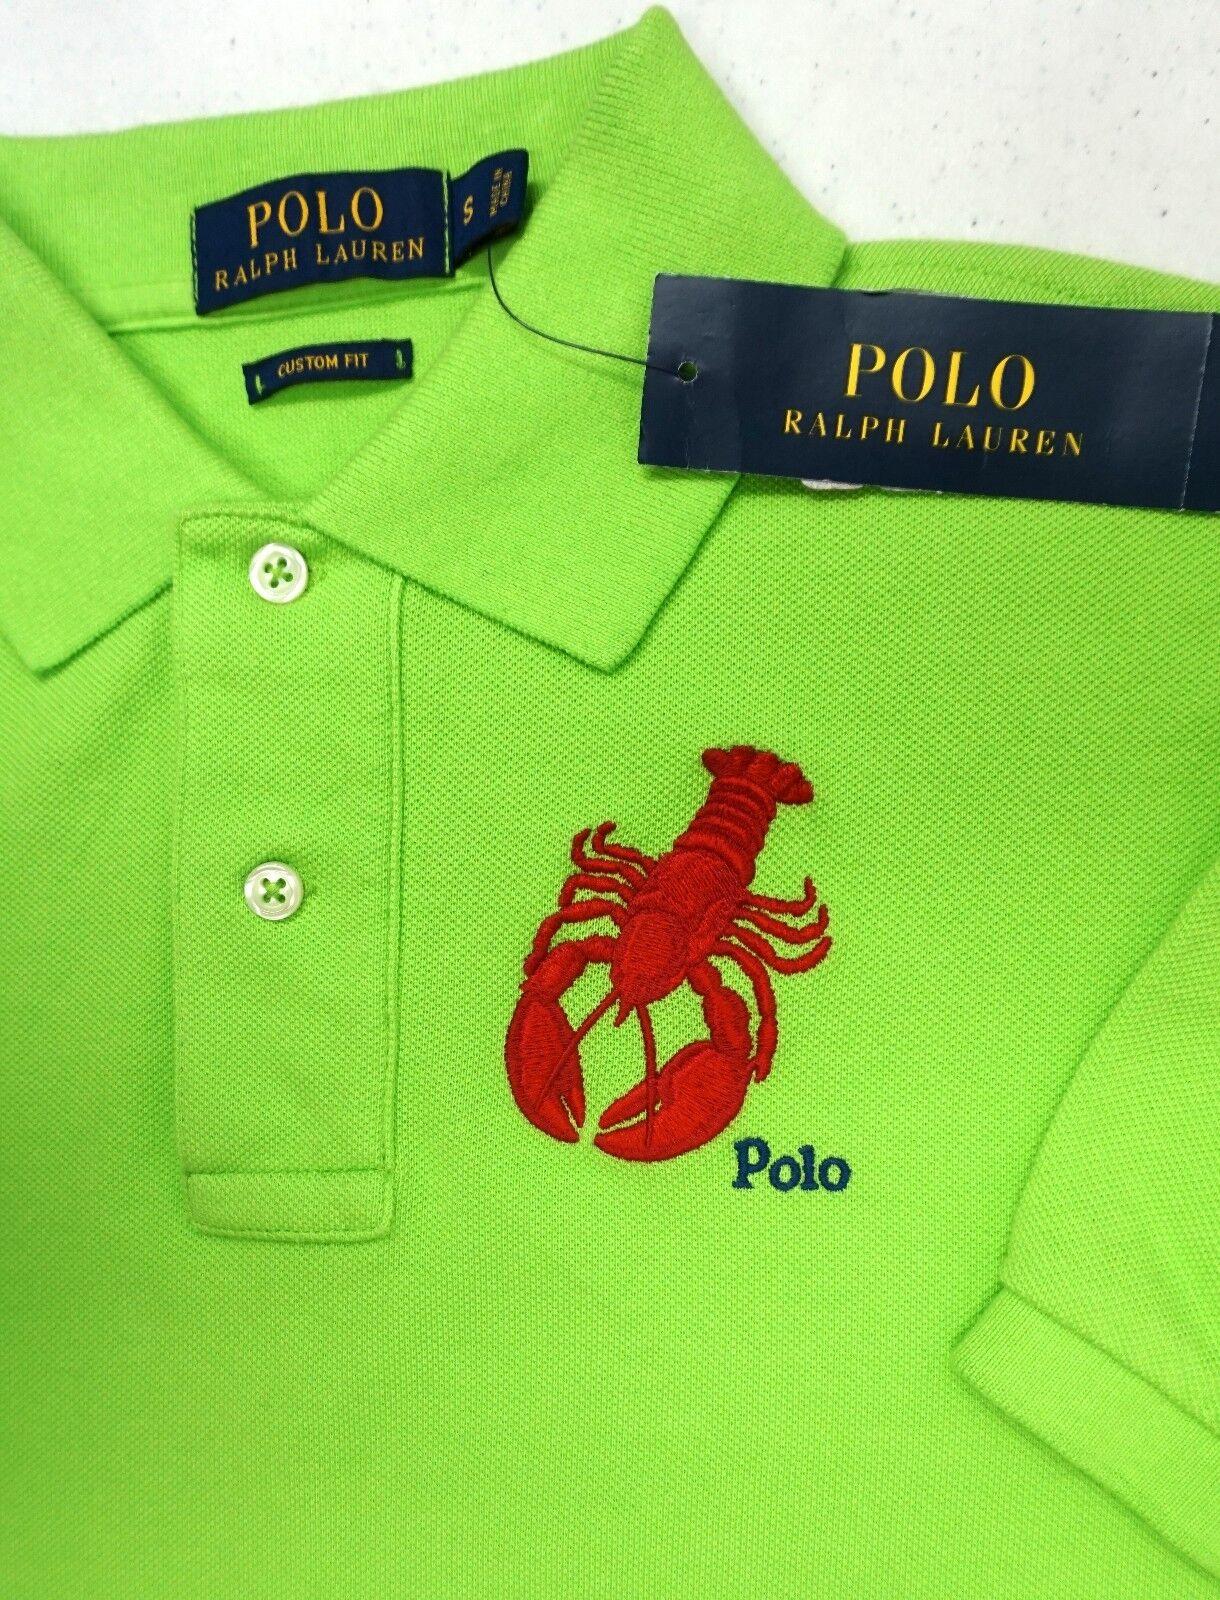 NWT  Polo Ralph Lauren Mesh Shirt Mens Size Small Green NEW Lobster Cotton